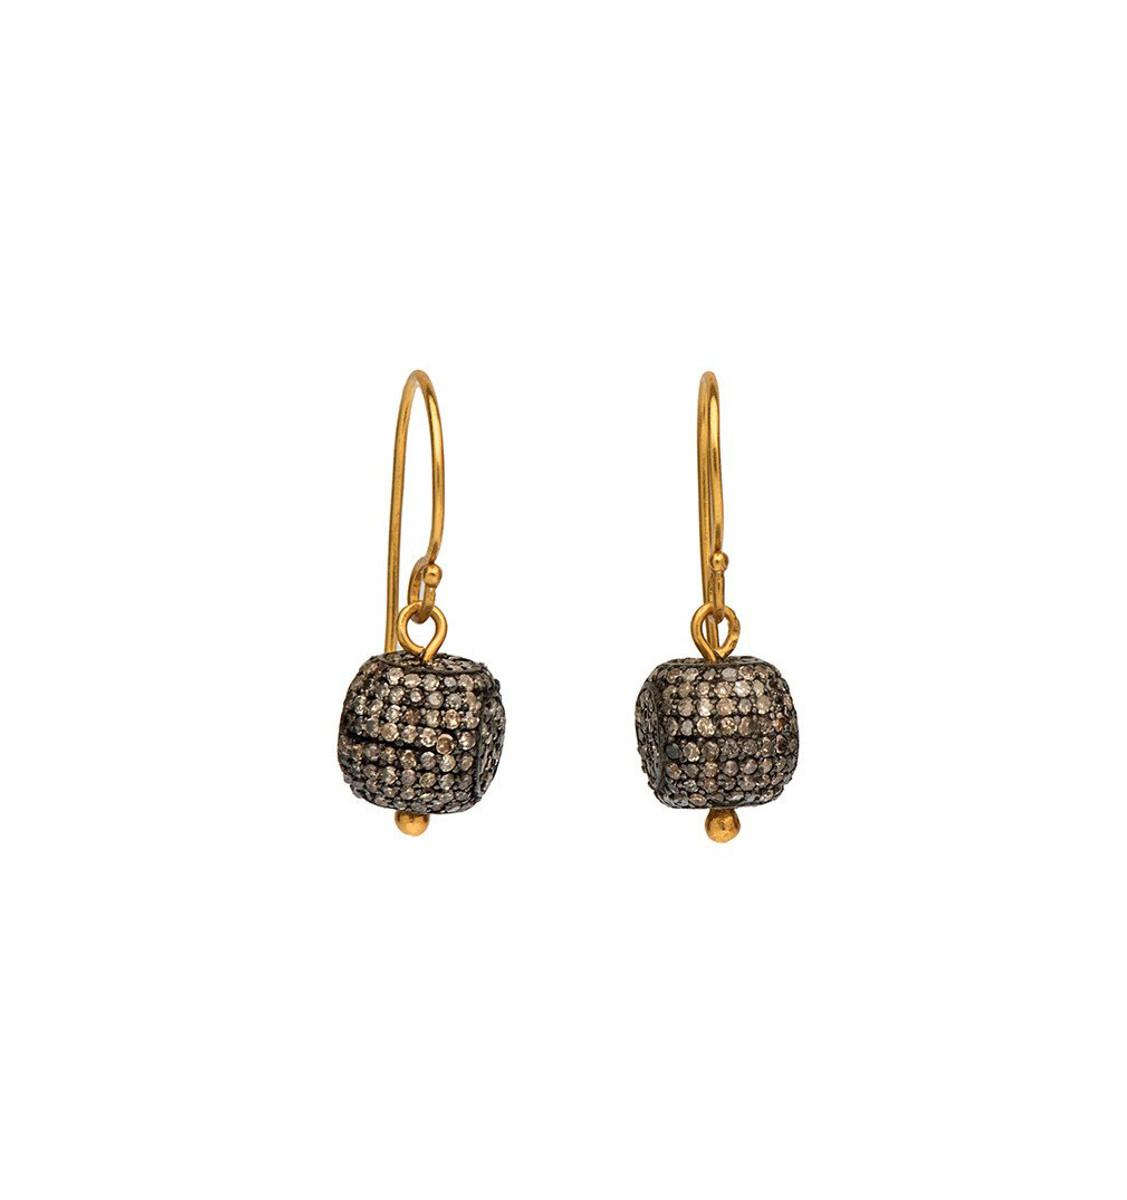 Diamond Ball Earrings by Nava Zahavi - New Arrival